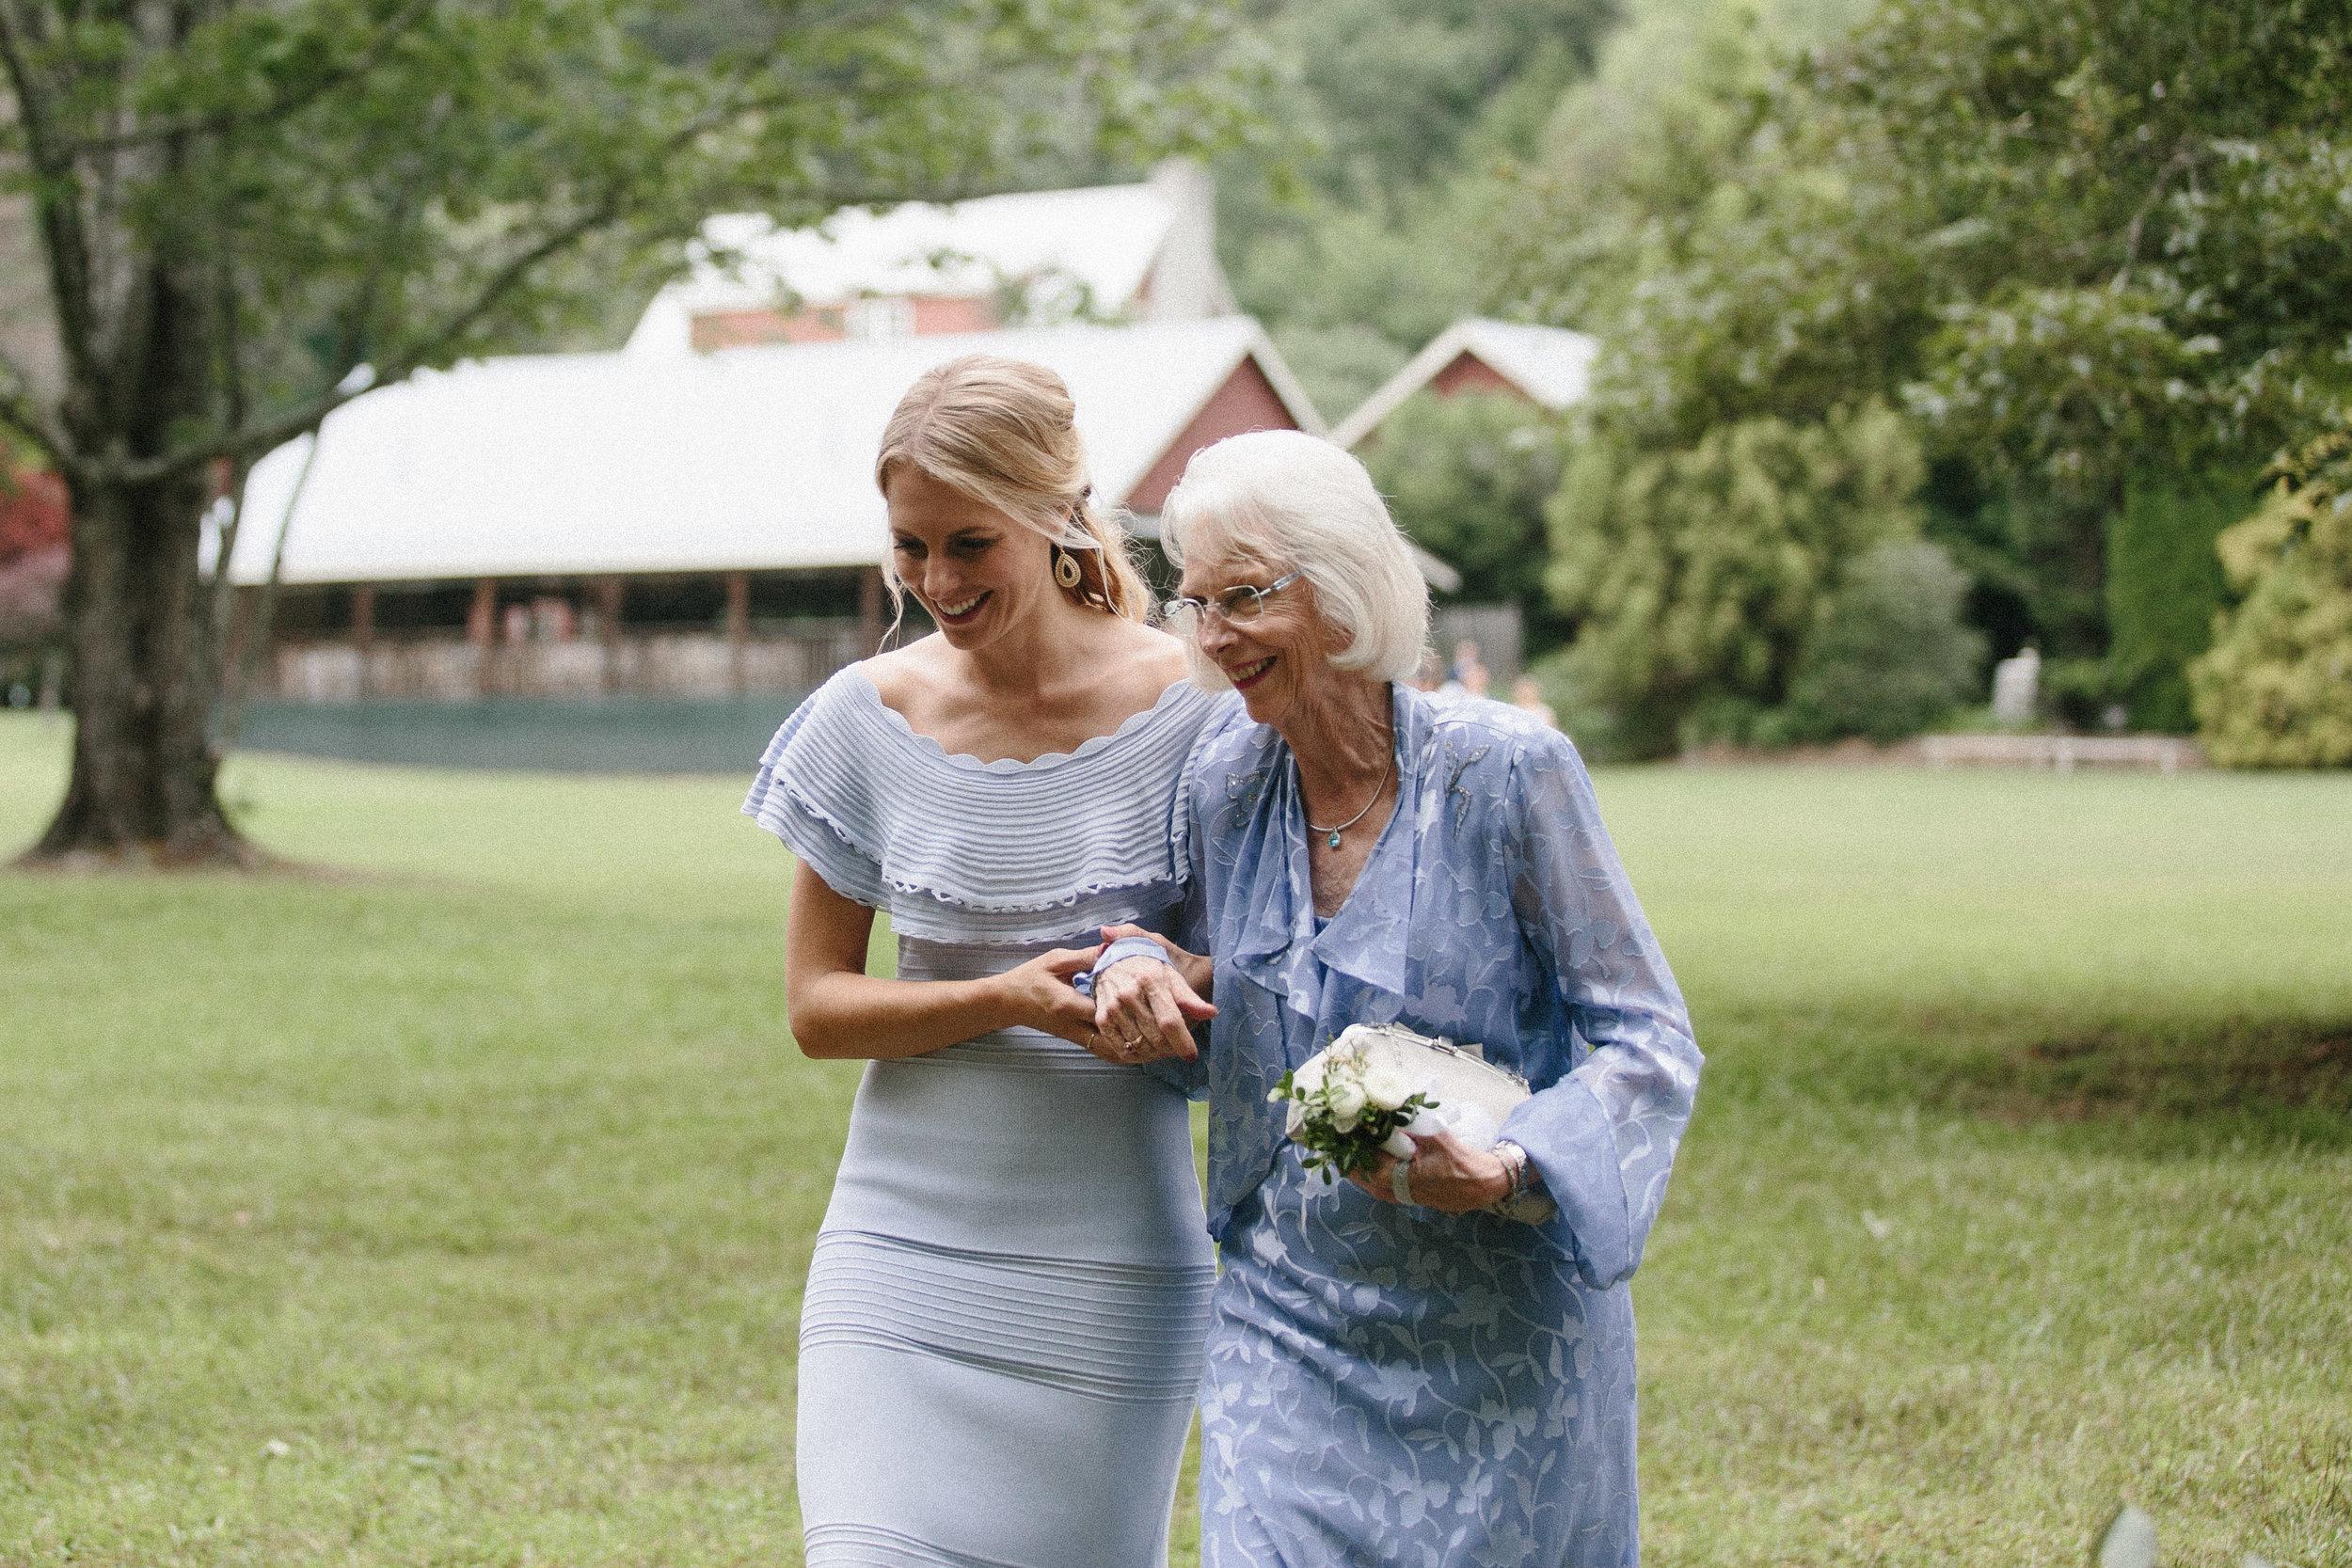 glen_ella_meadow_creekside_atlanta_wedding_photographers_1659.jpg